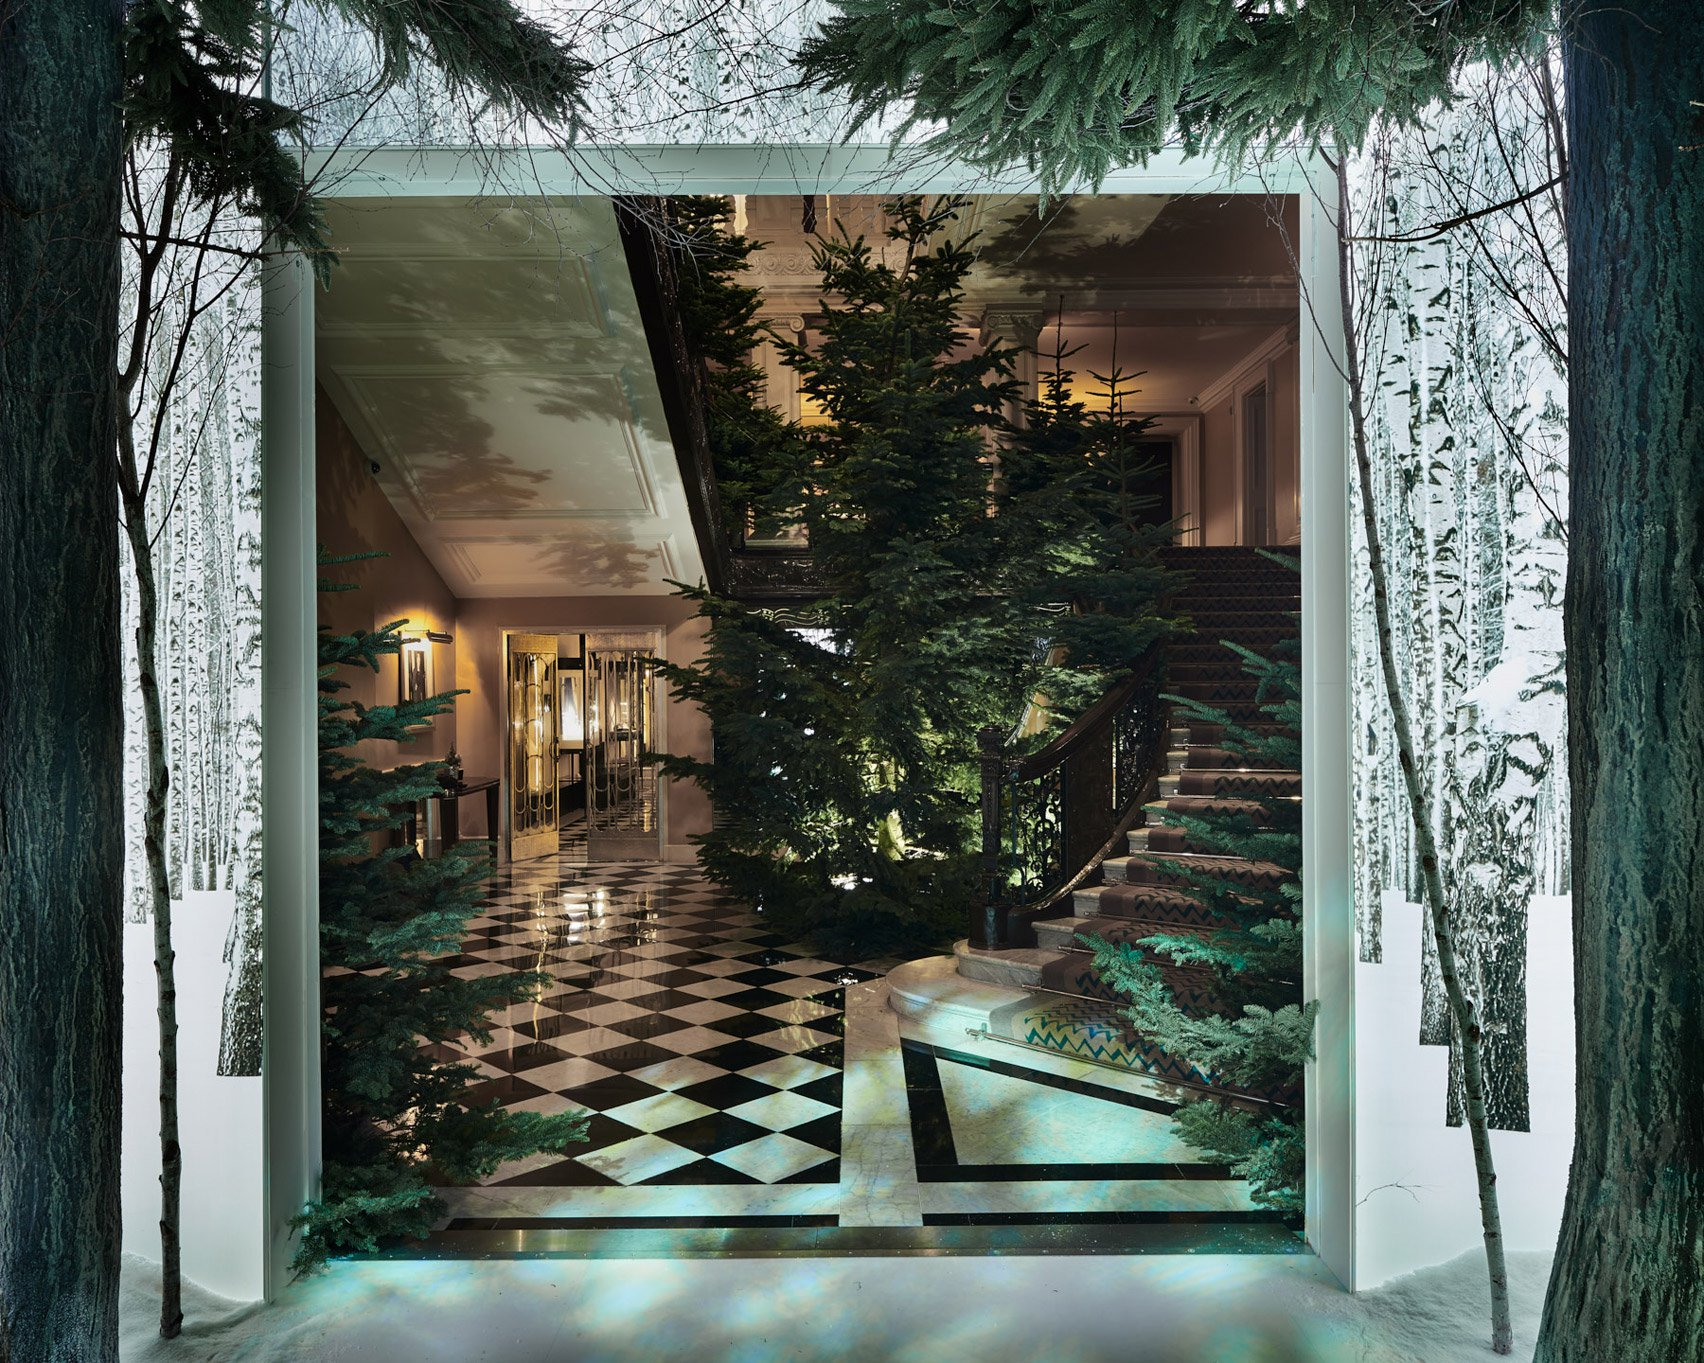 jony-ive-marc-newson-christmas-tree-design-claridges-london_dezeen_1704_col_5